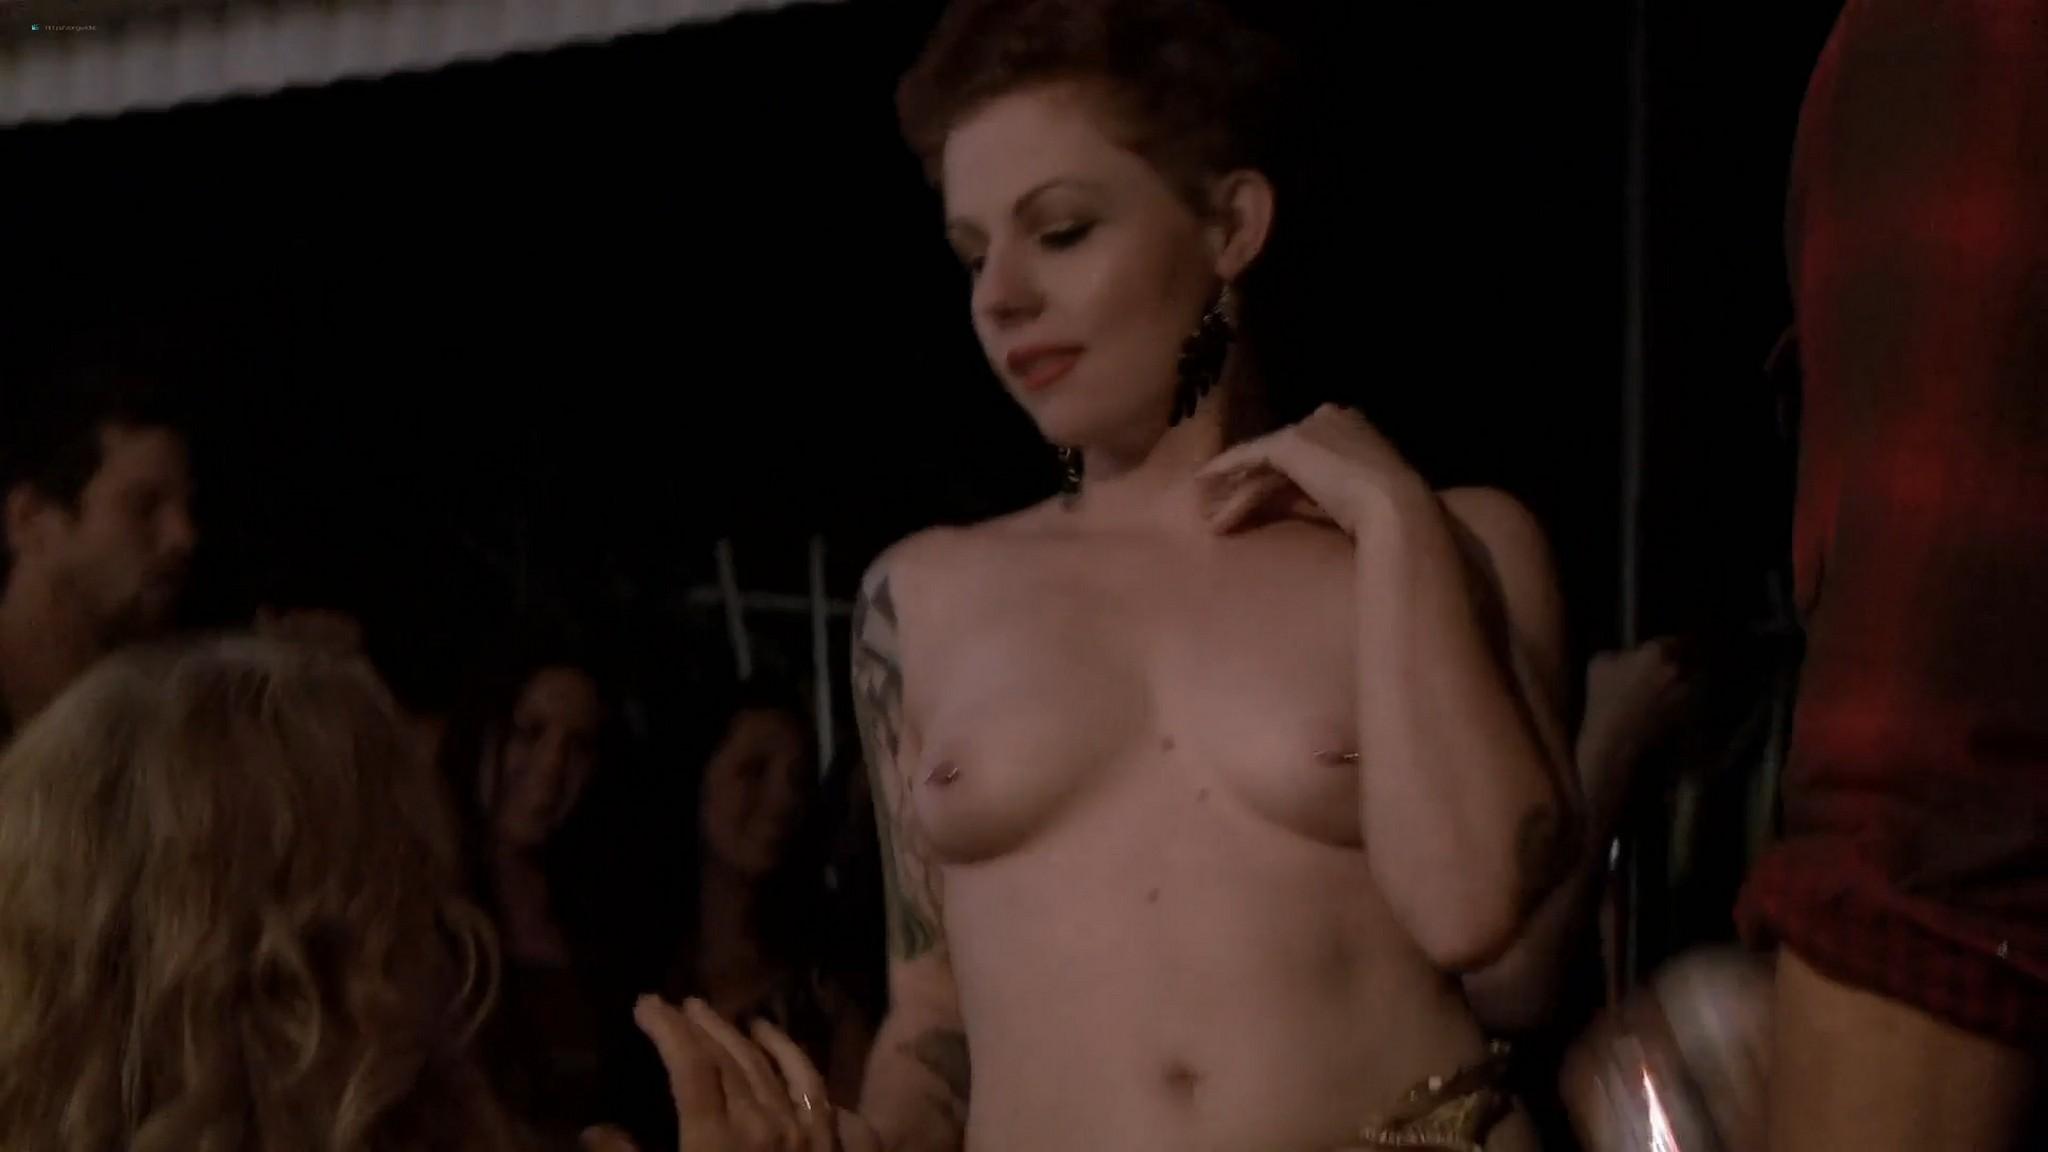 Taylor Cole hot sex Tiffany Shepis Francesca Brandelius naked The Violent Kind 2010 HD 1080p BluRay 007